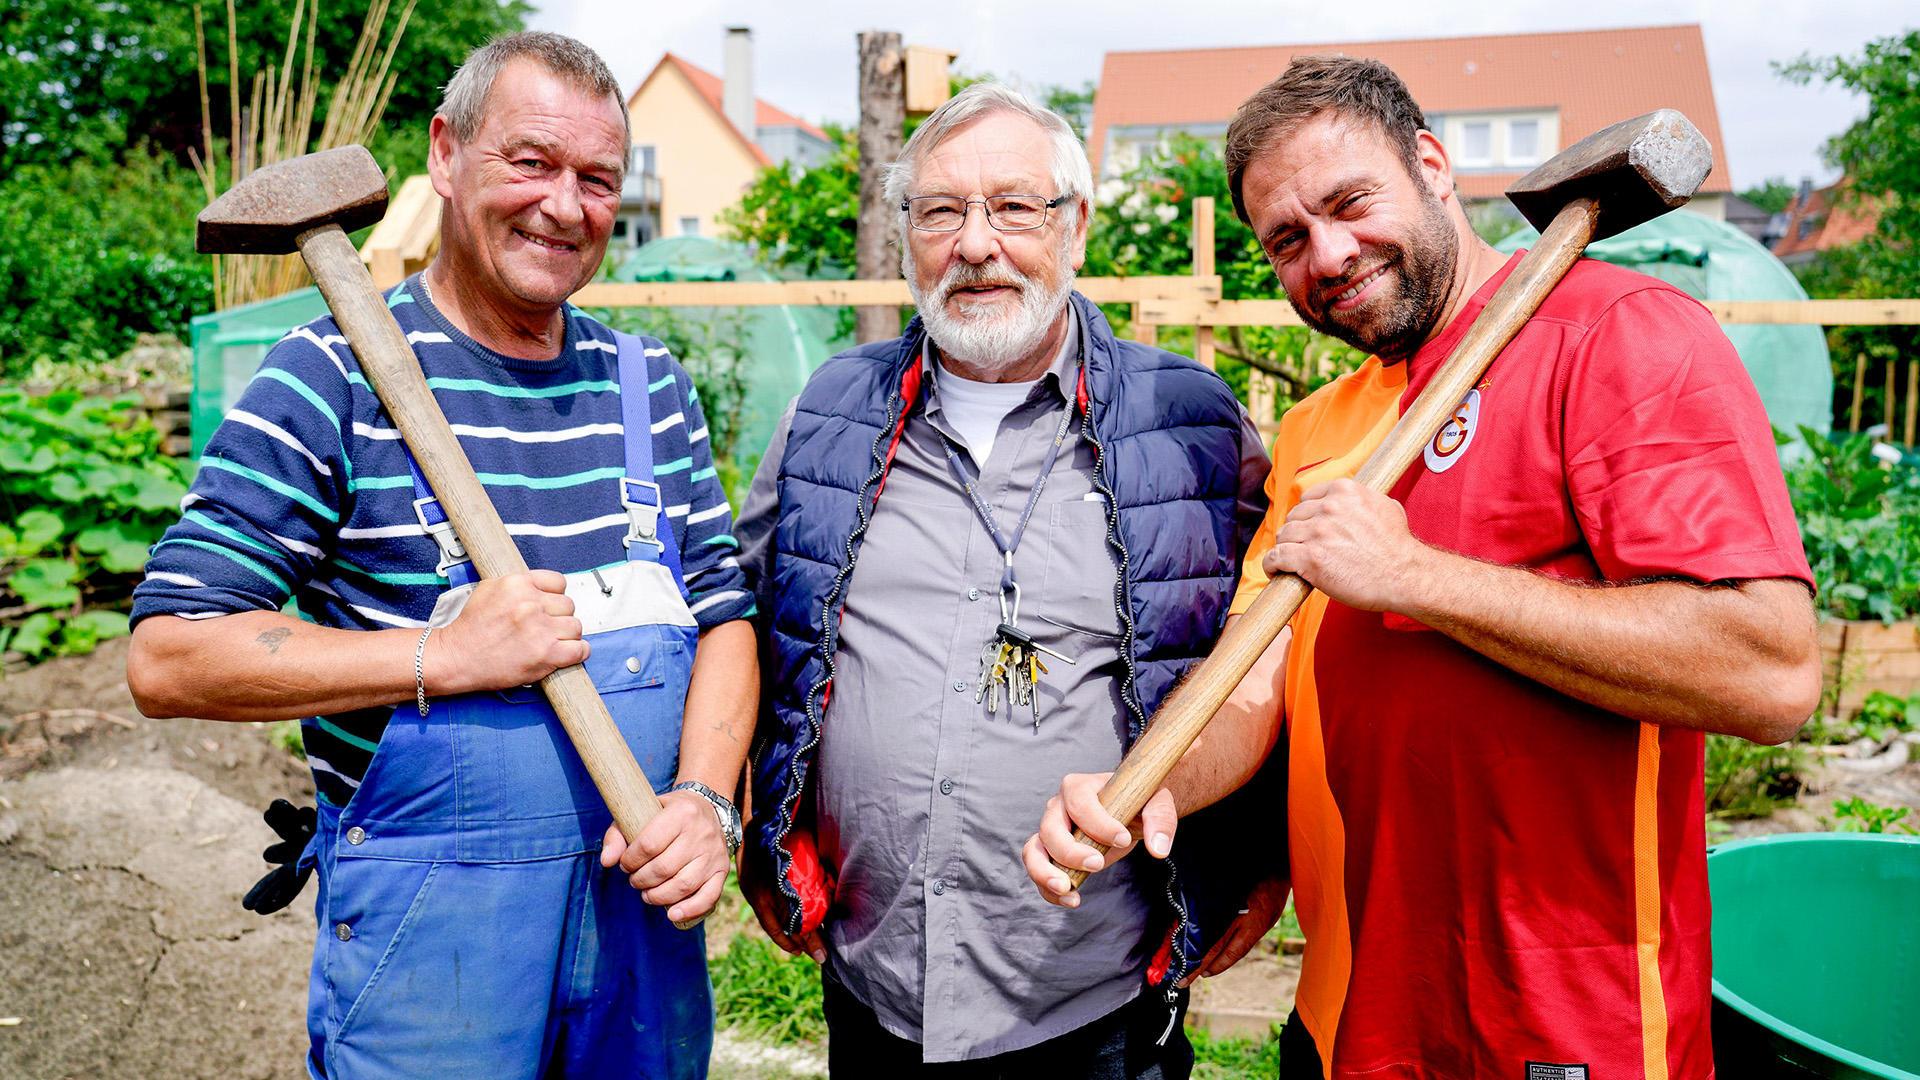 Heute u.a. mit: Claus & seine Freund - Leons Laube   Folge 9